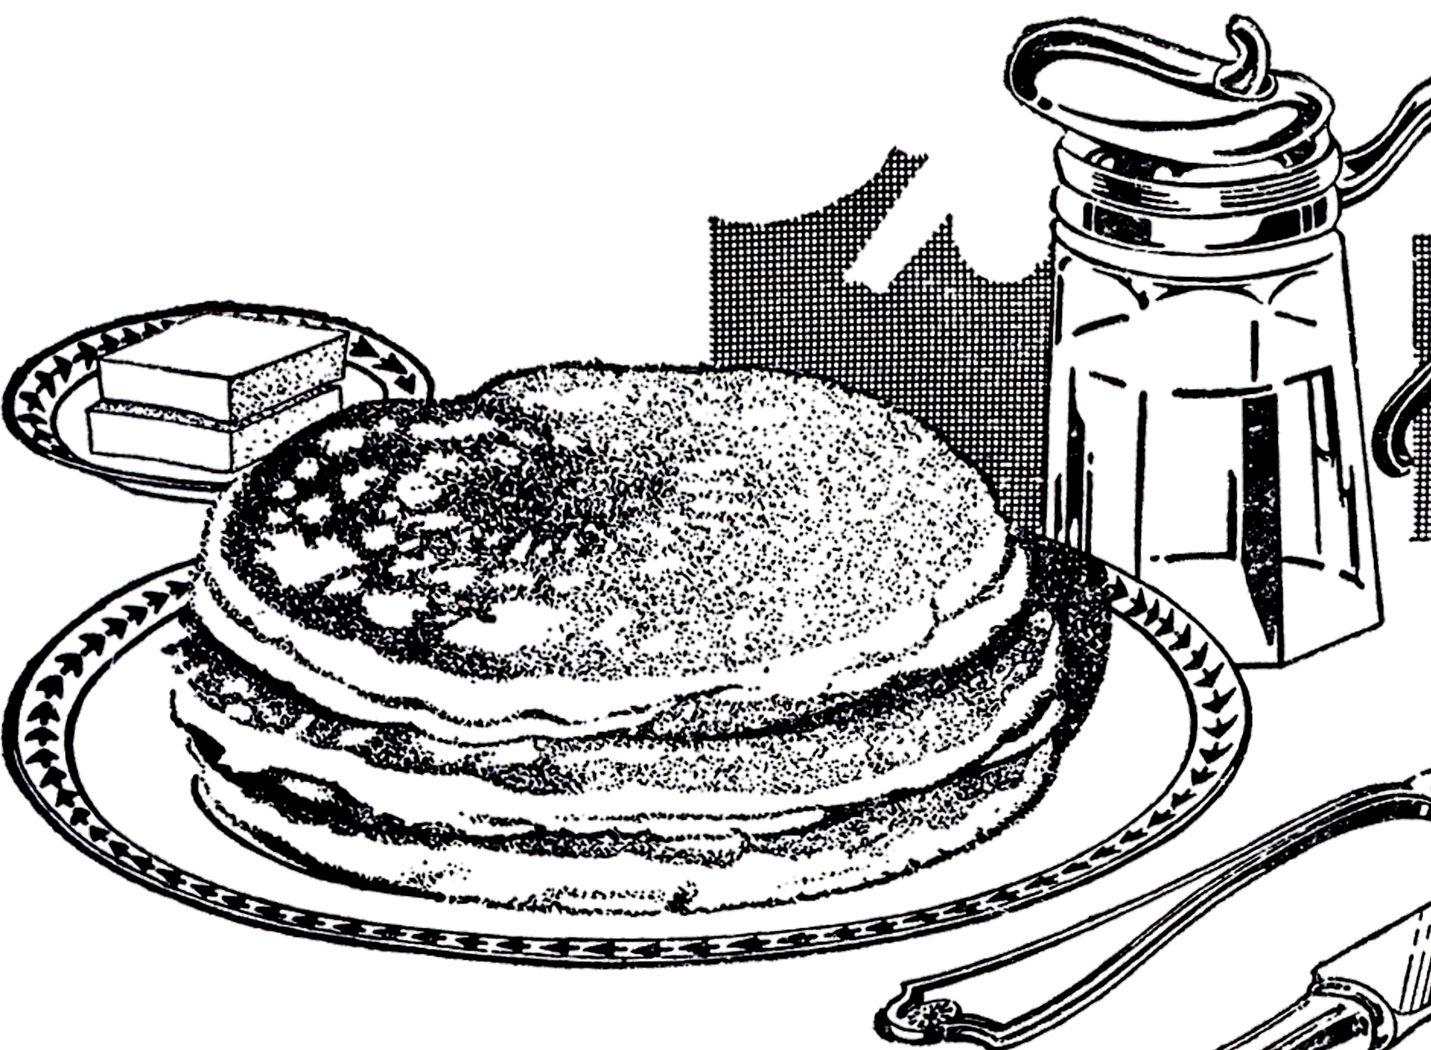 Vintage Pancake Breakfast Image The Graphics Fairy Breakfast Pancakes Pancakes Graphics Fairy